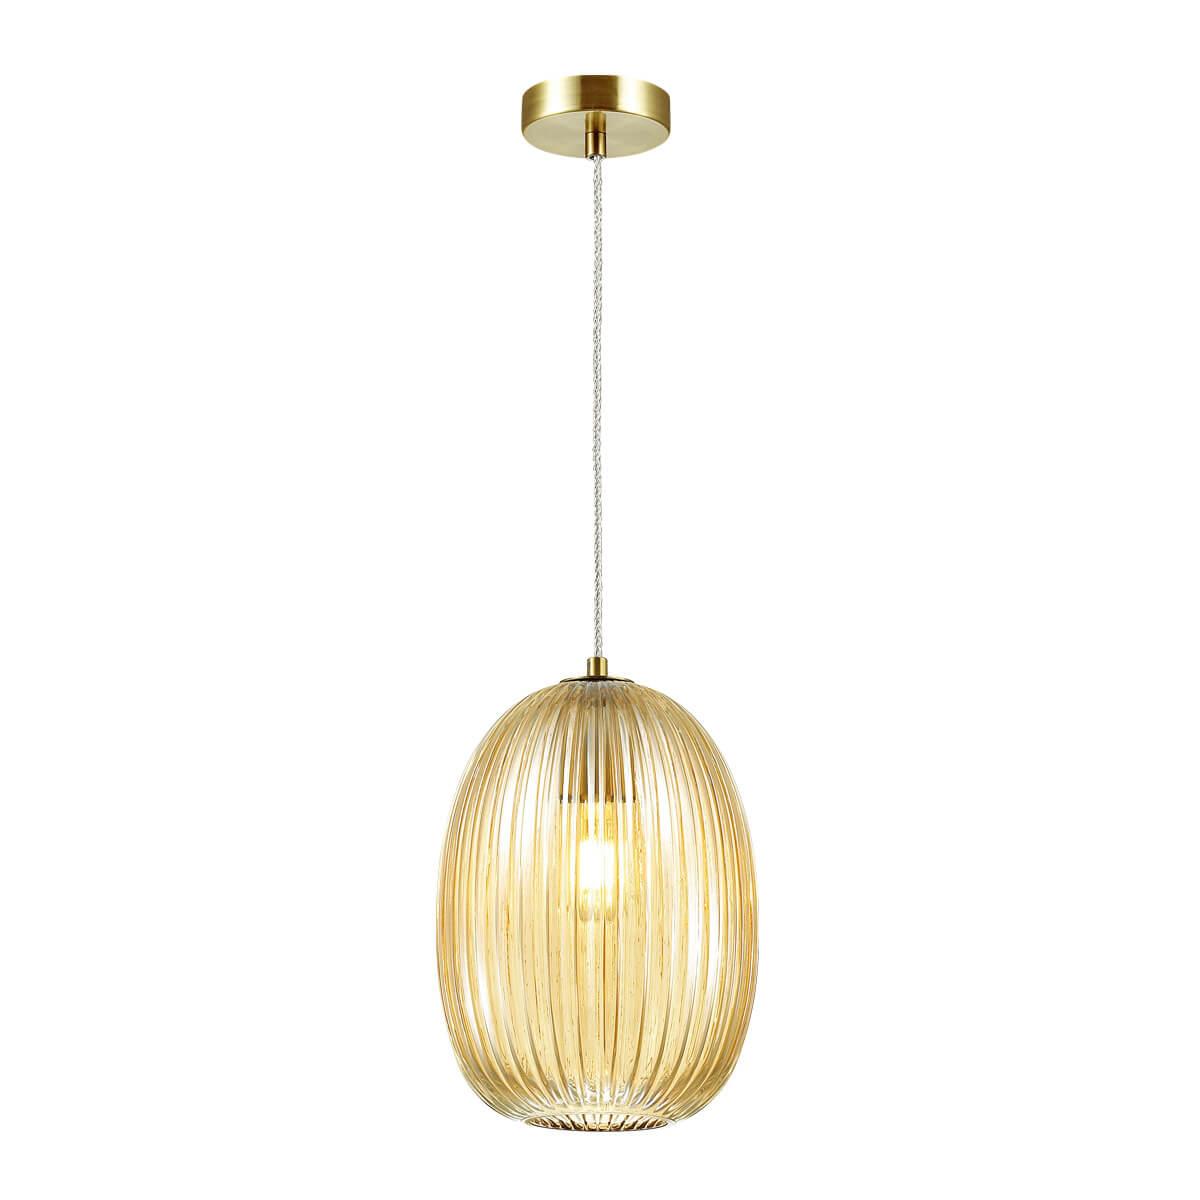 Светильник Odeon Light 4704/1 Pendant светильник odeon light 4702 1 dori